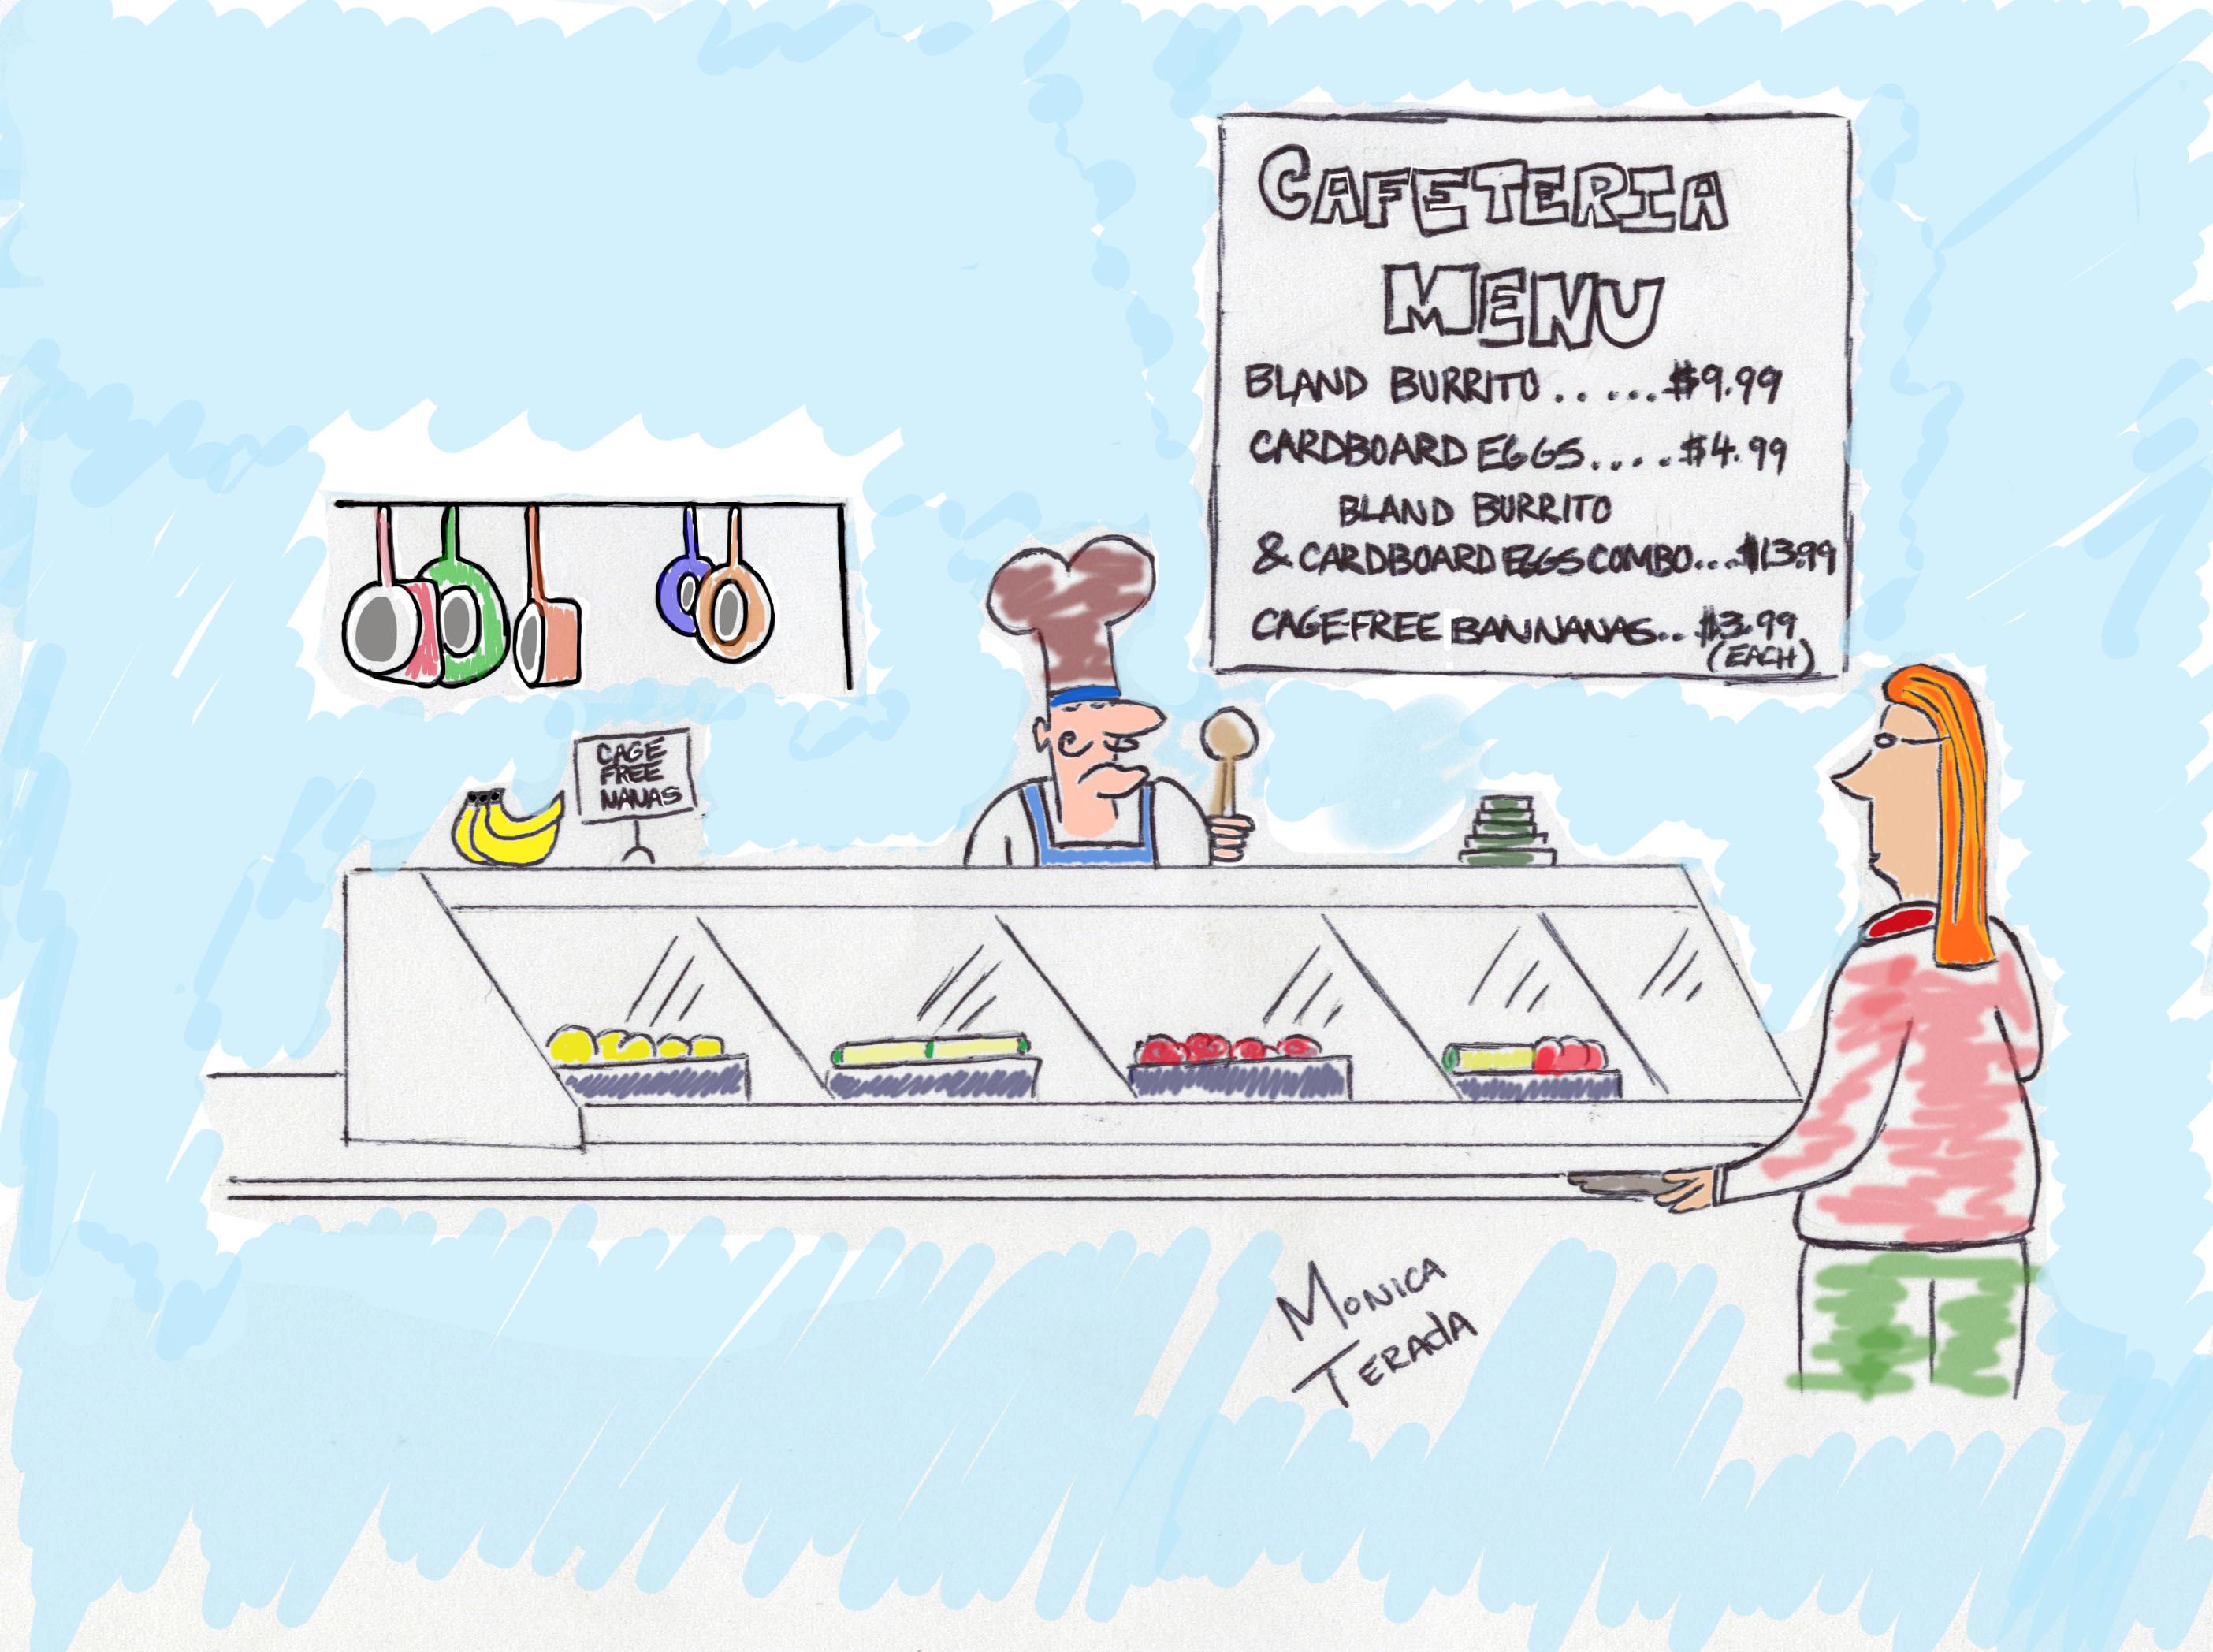 cafeteria-colored-ii